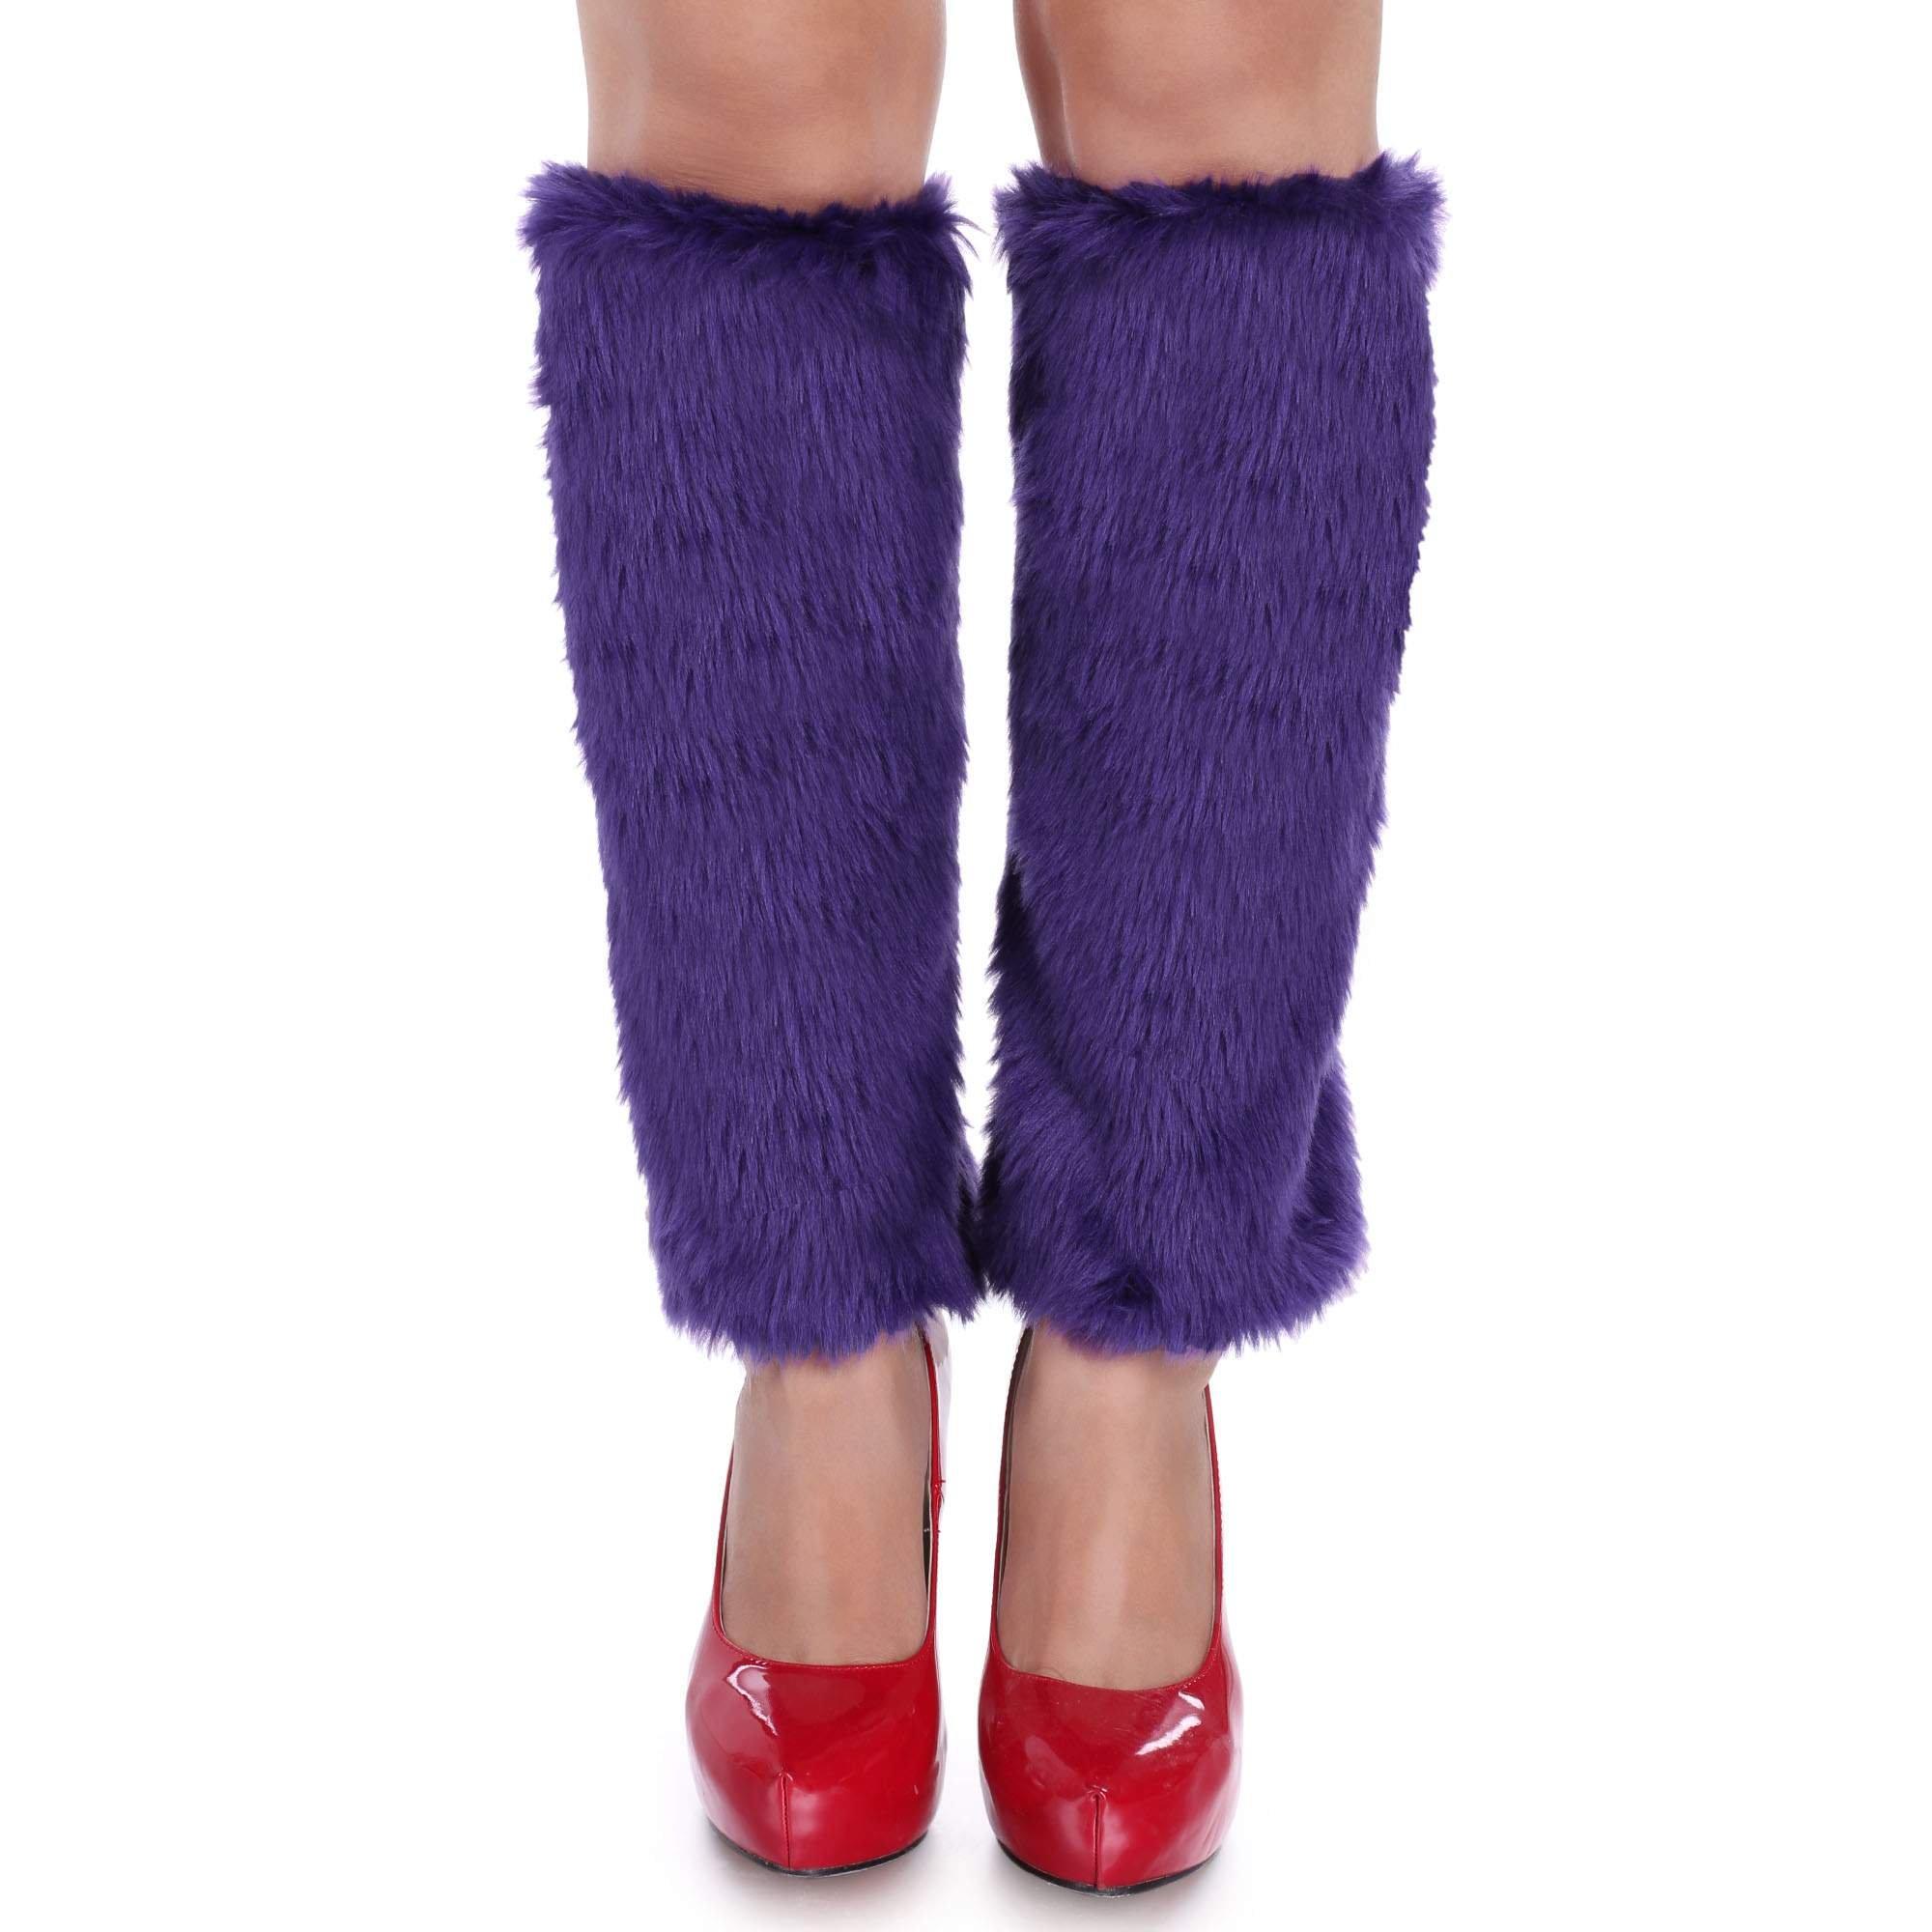 Zeagoo Women Fashion Furry Leg Warmers Fur Cover for Winter Keep Warm